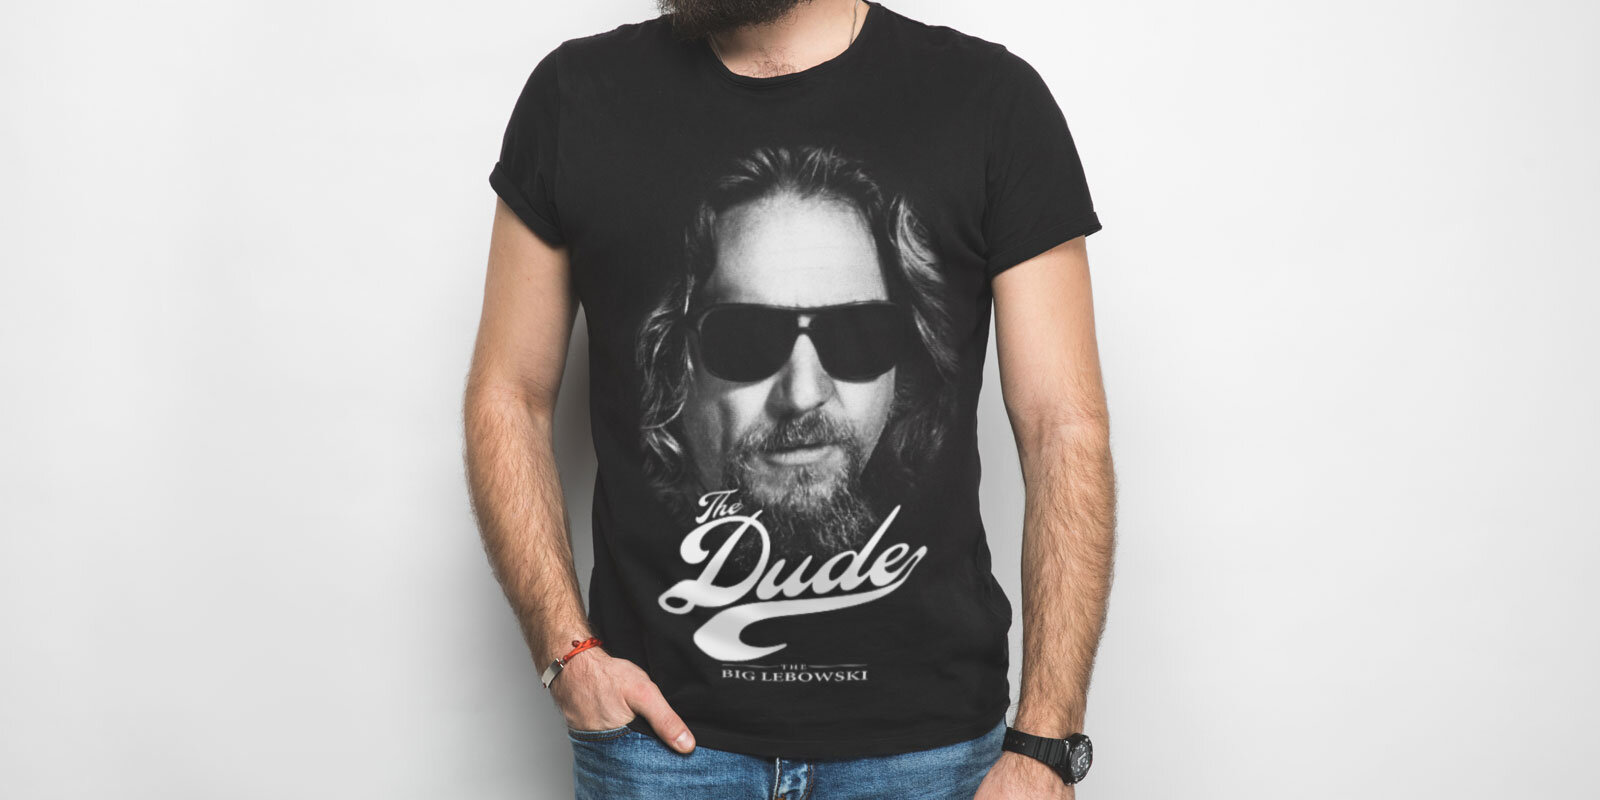 https://www.shirtstore.fi/pub_docs/files/Man/MAN-HalfLeft-Lebowski.jpg